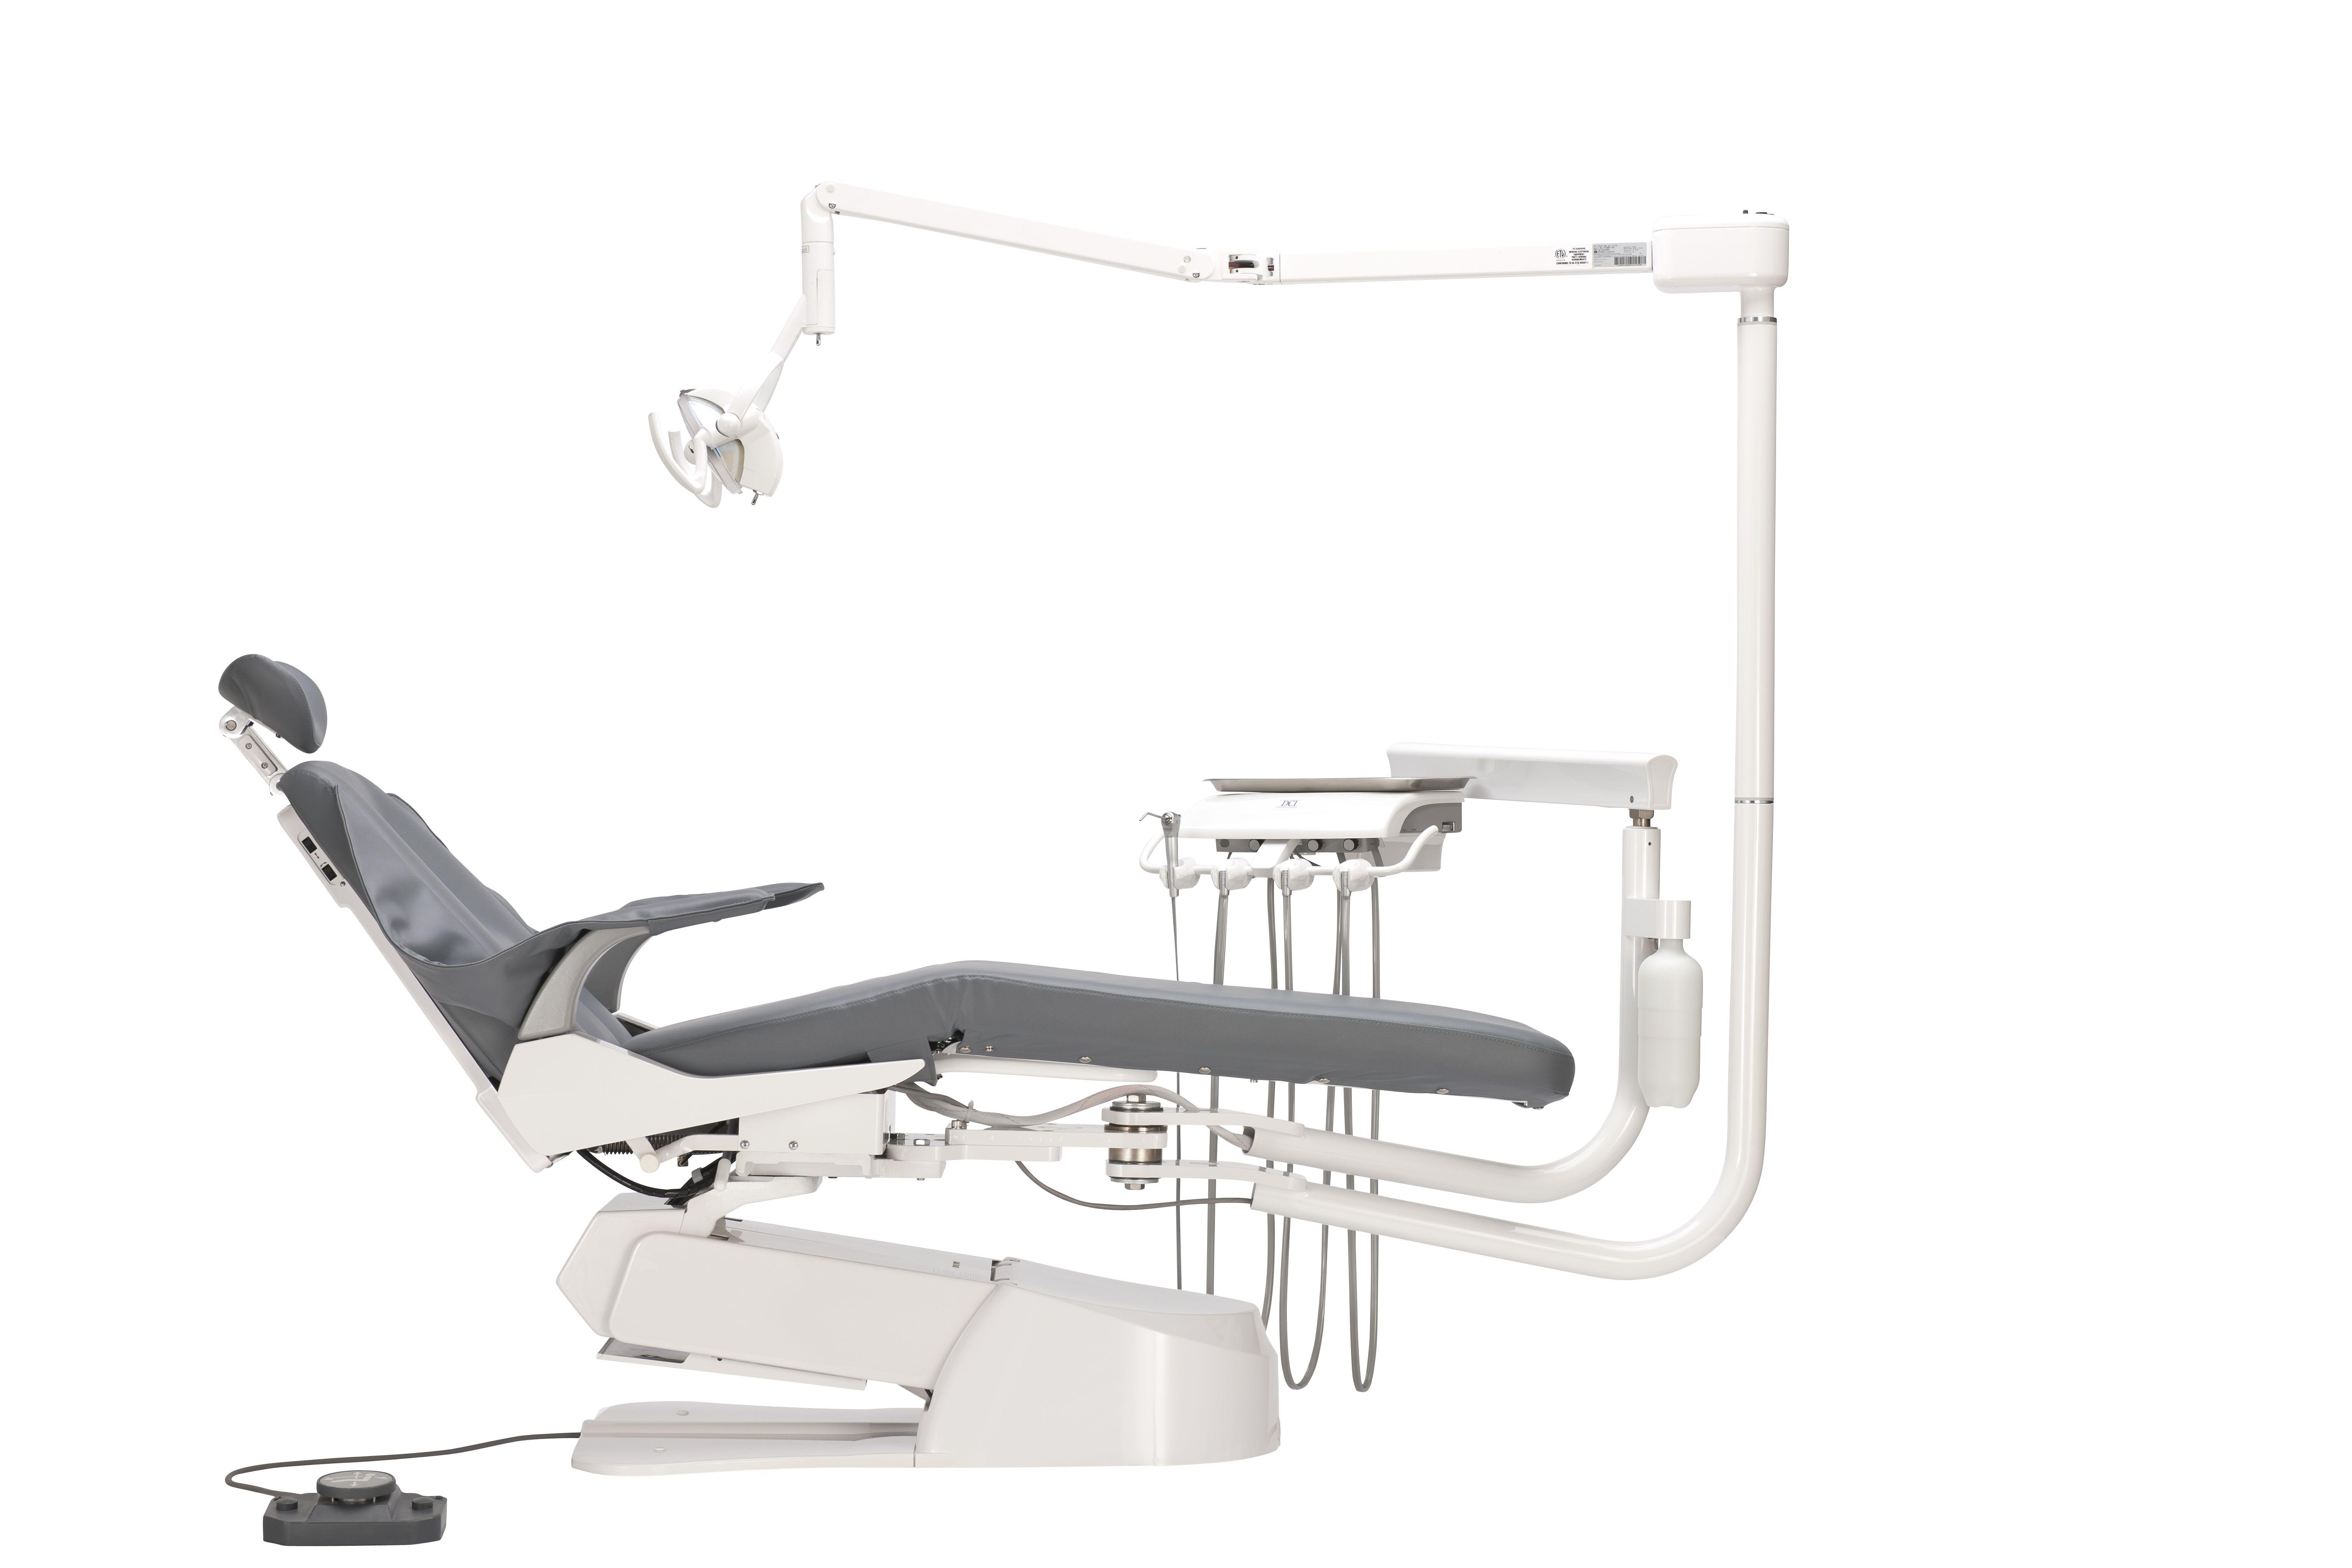 DCI Swing Mount Pole w/Auto Dental Unit u0026 Light Pole ...  sc 1 st  Pinterest & DCI Swing Mount Pole w/Auto Dental Unit u0026 Light Pole Gray | Dental ...